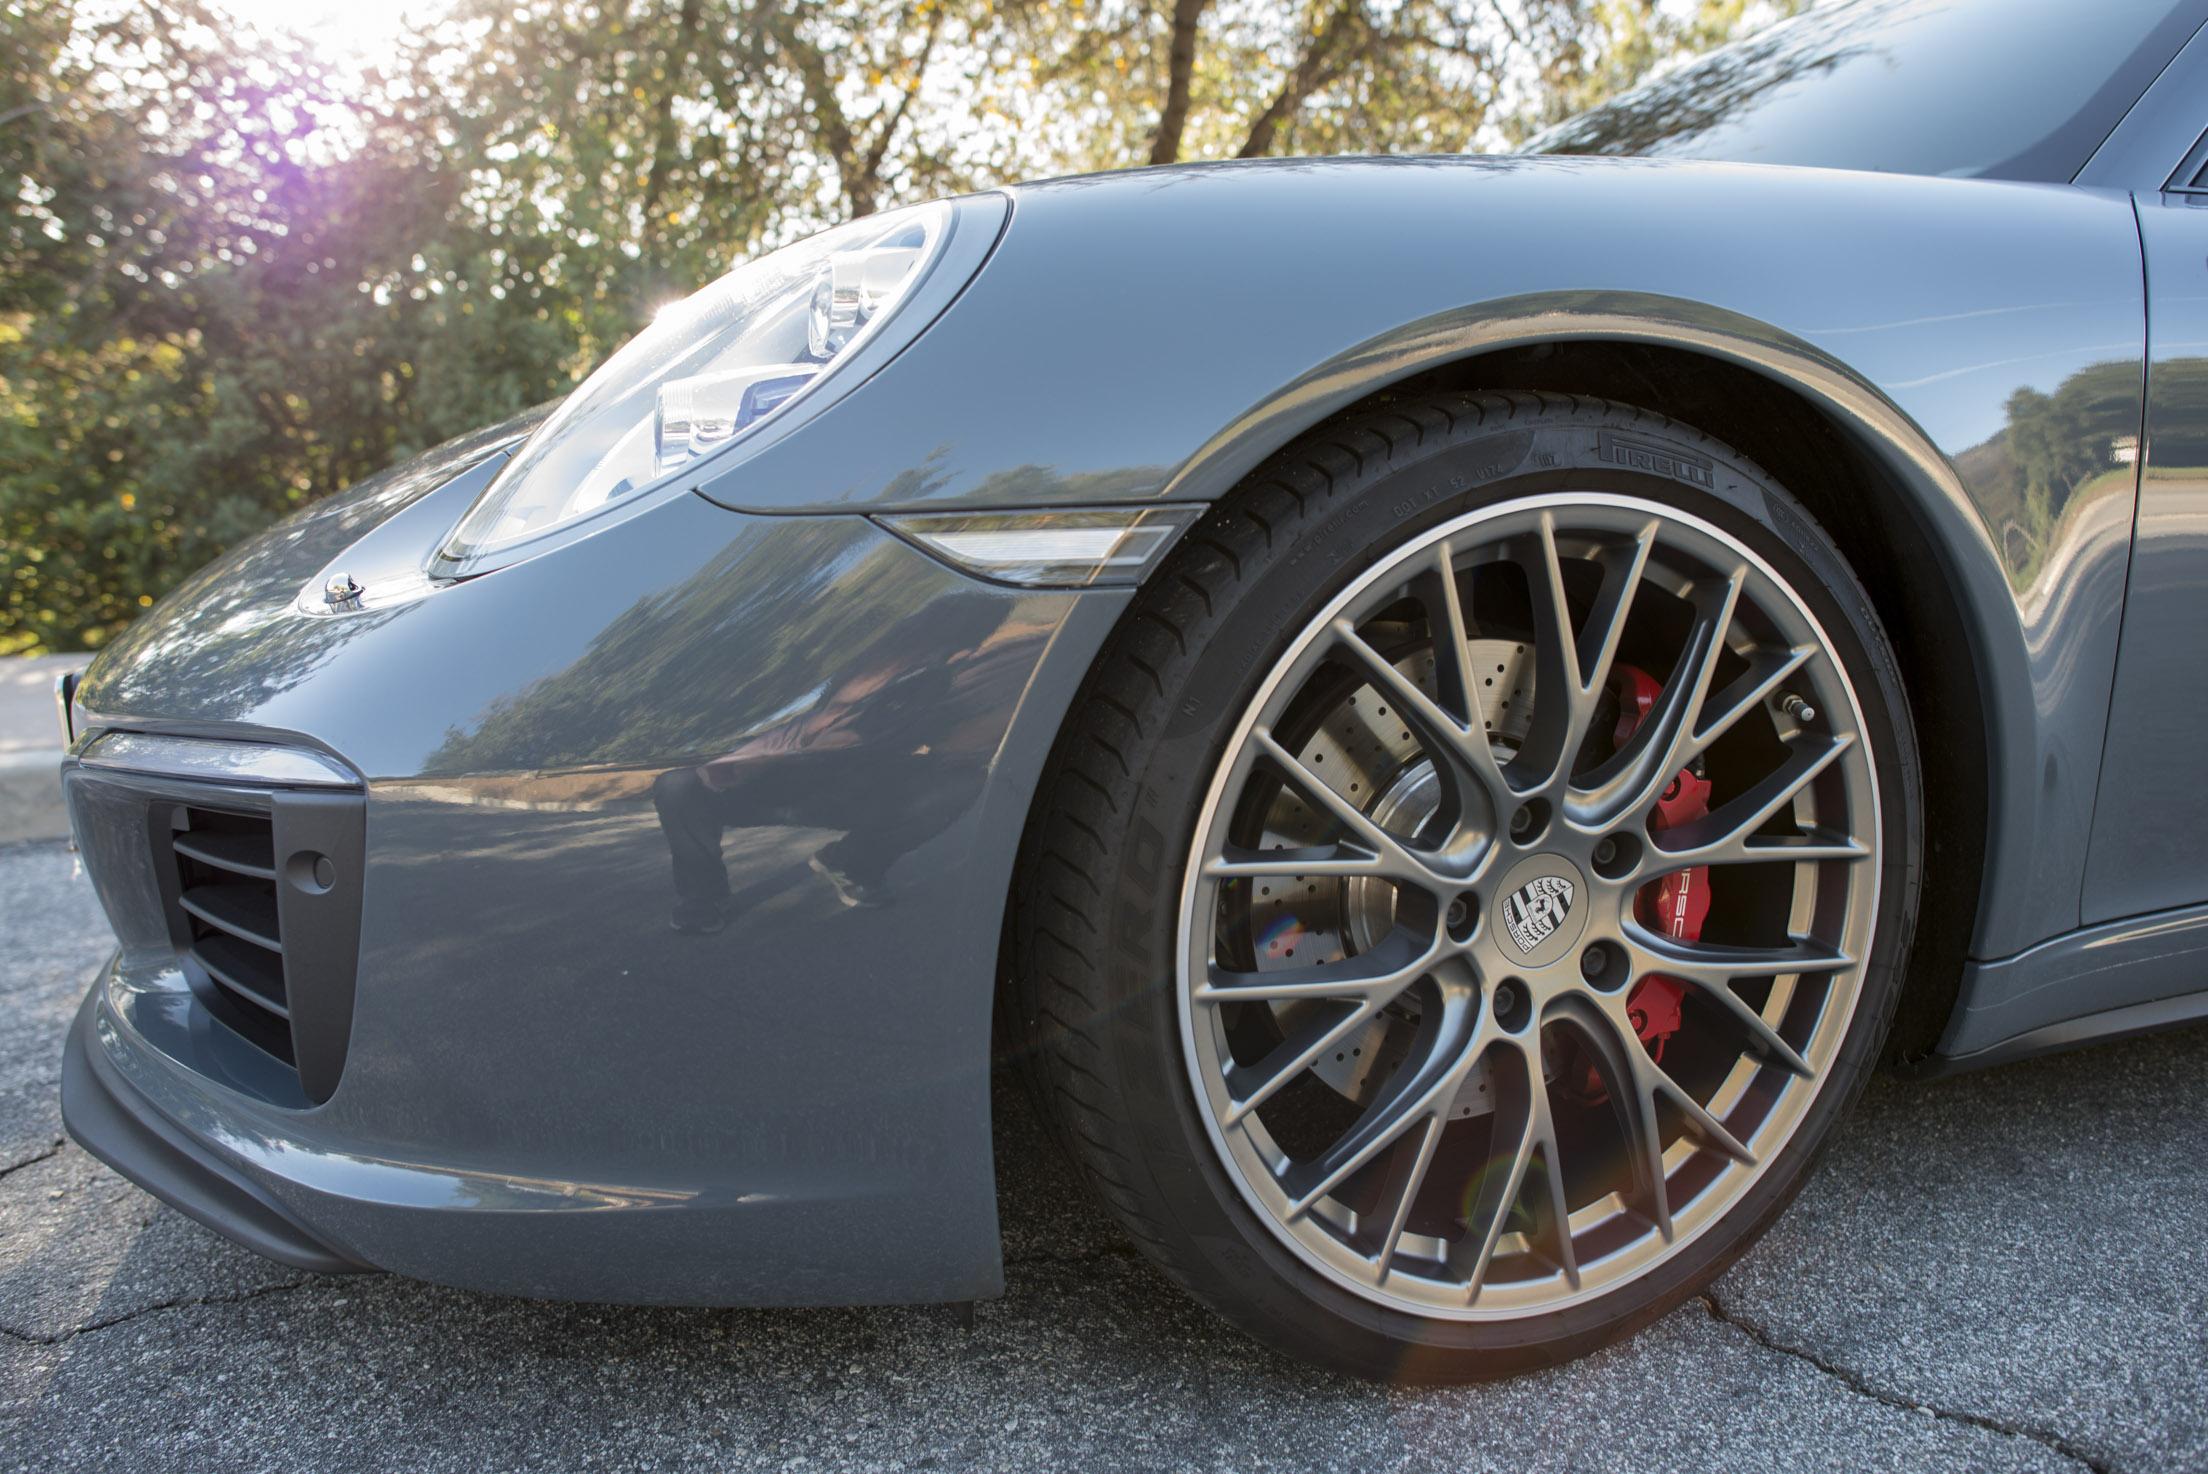 TrackWorthy - Porsche 911 C4S 991.2 - Canyon Roads - 07